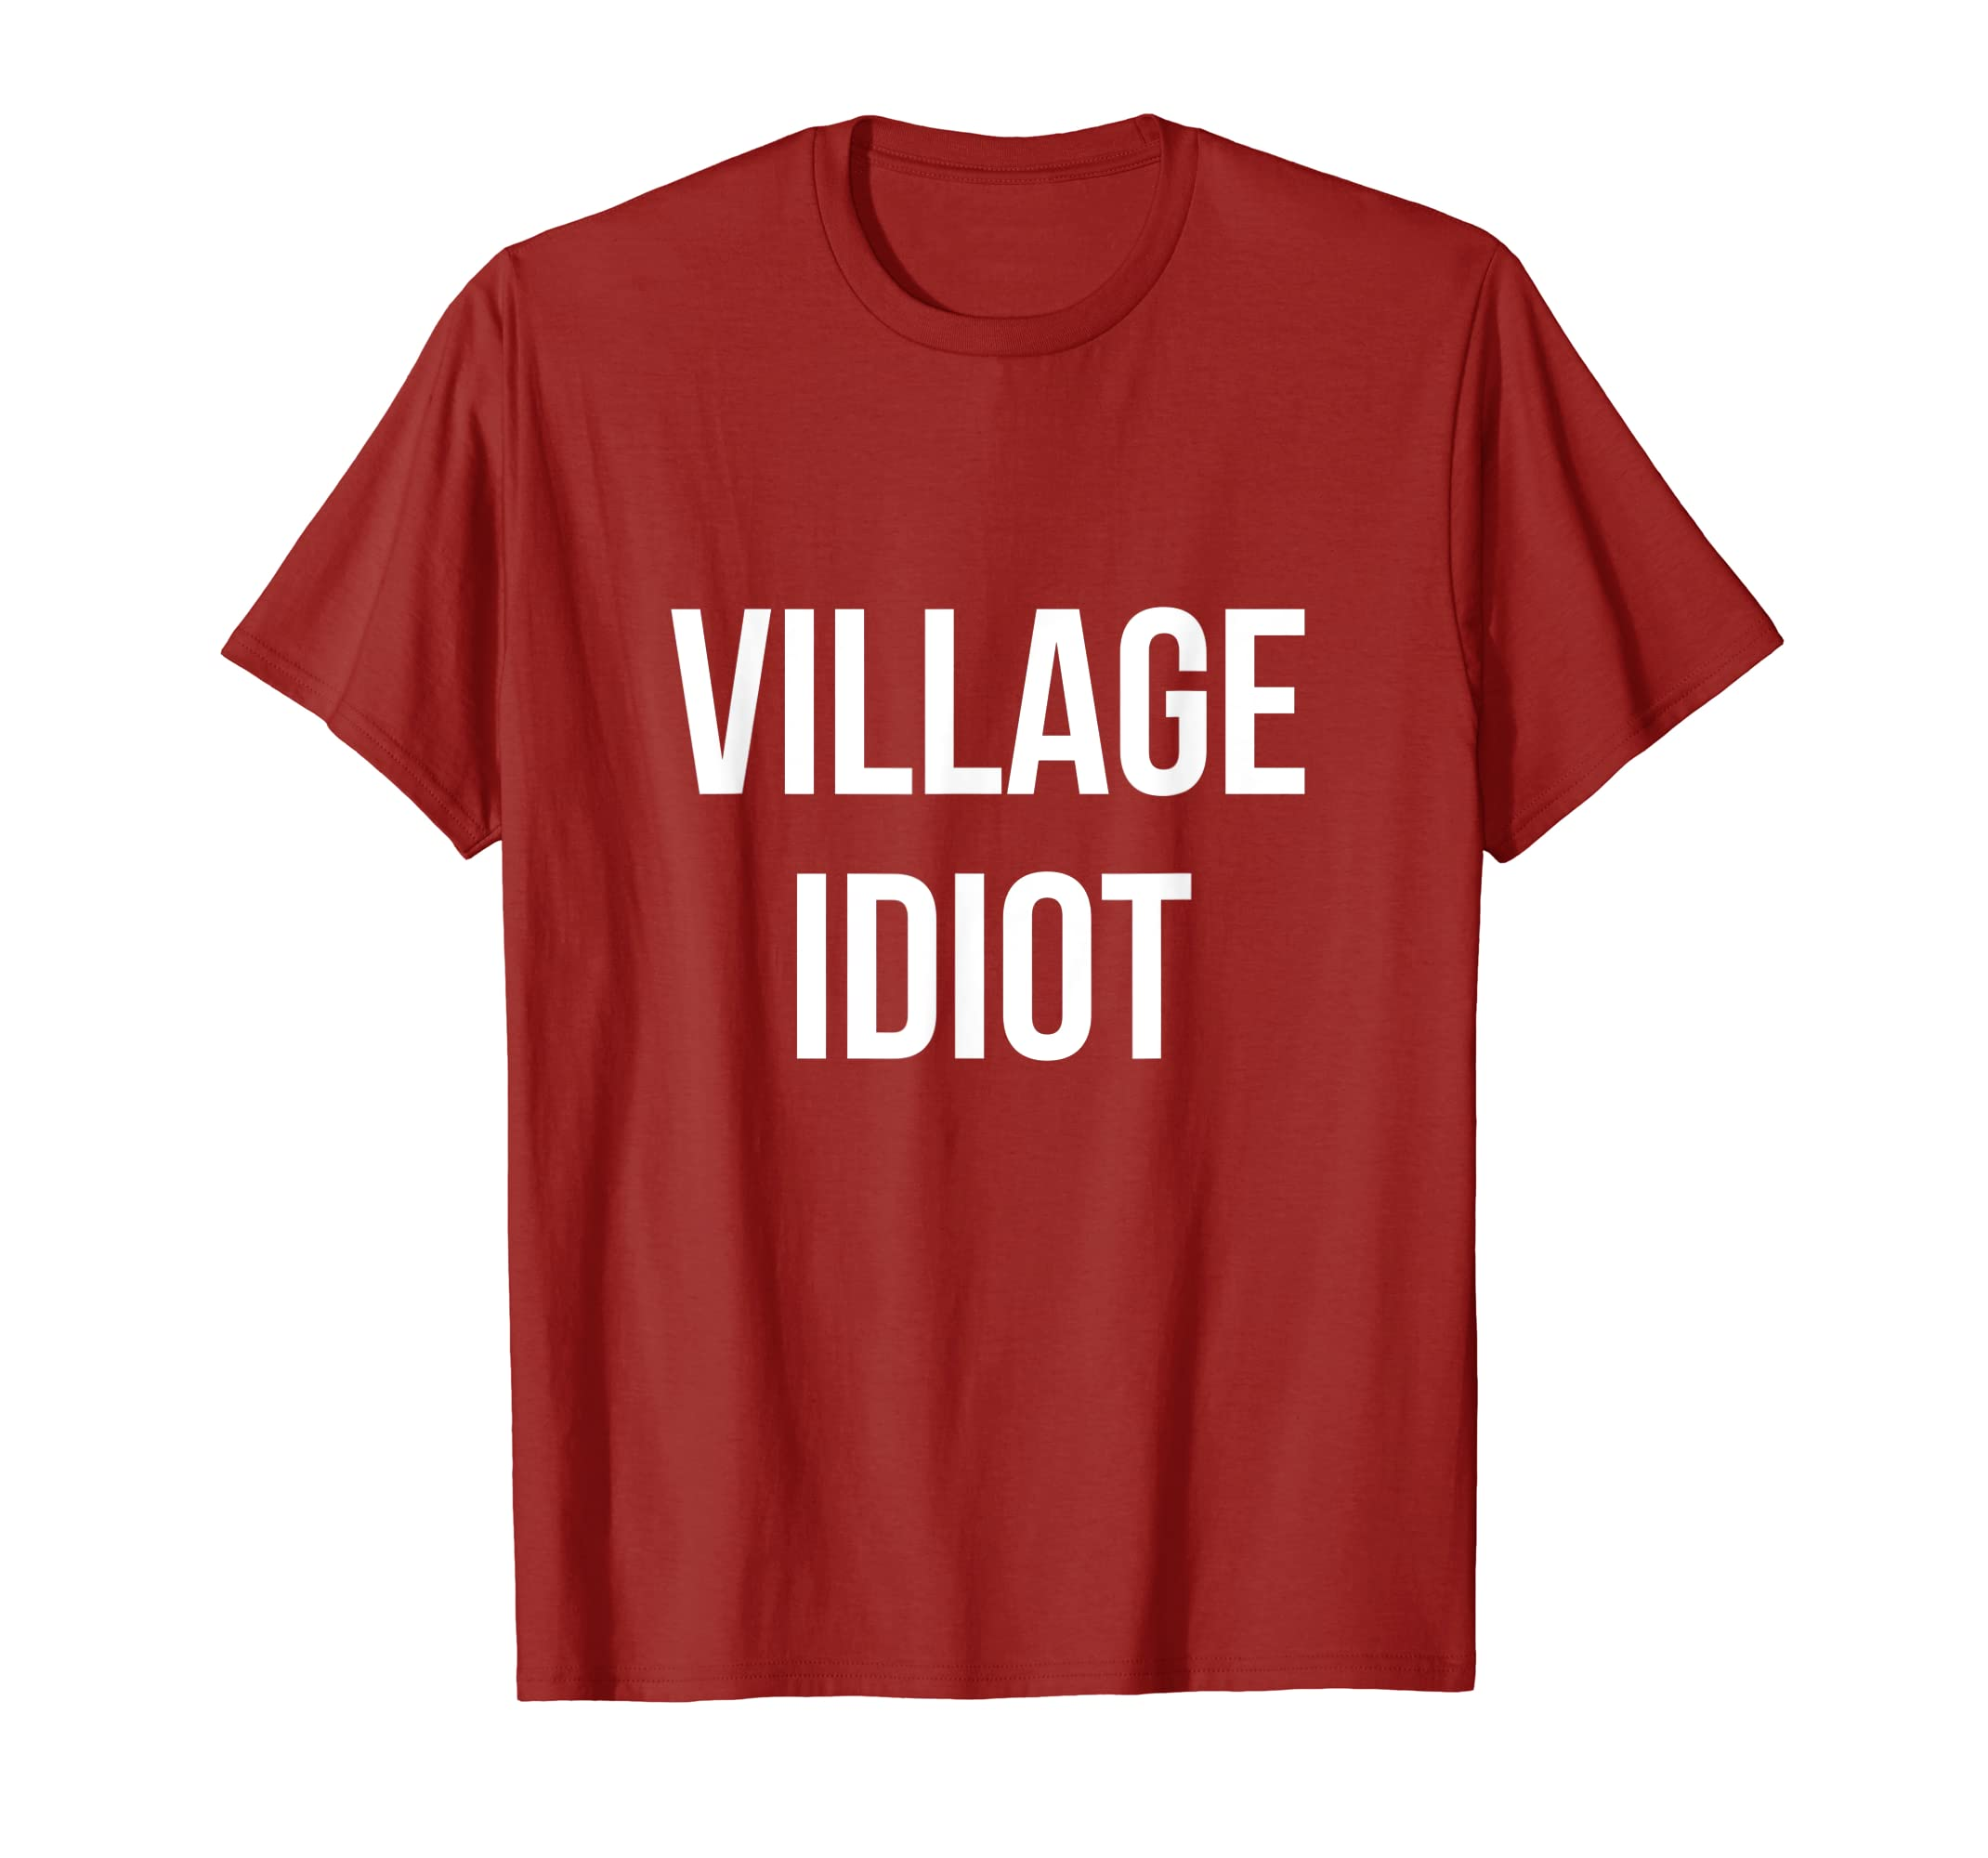 Village Idiot shirt - Funny Dumb Person Tshirt-ANZ